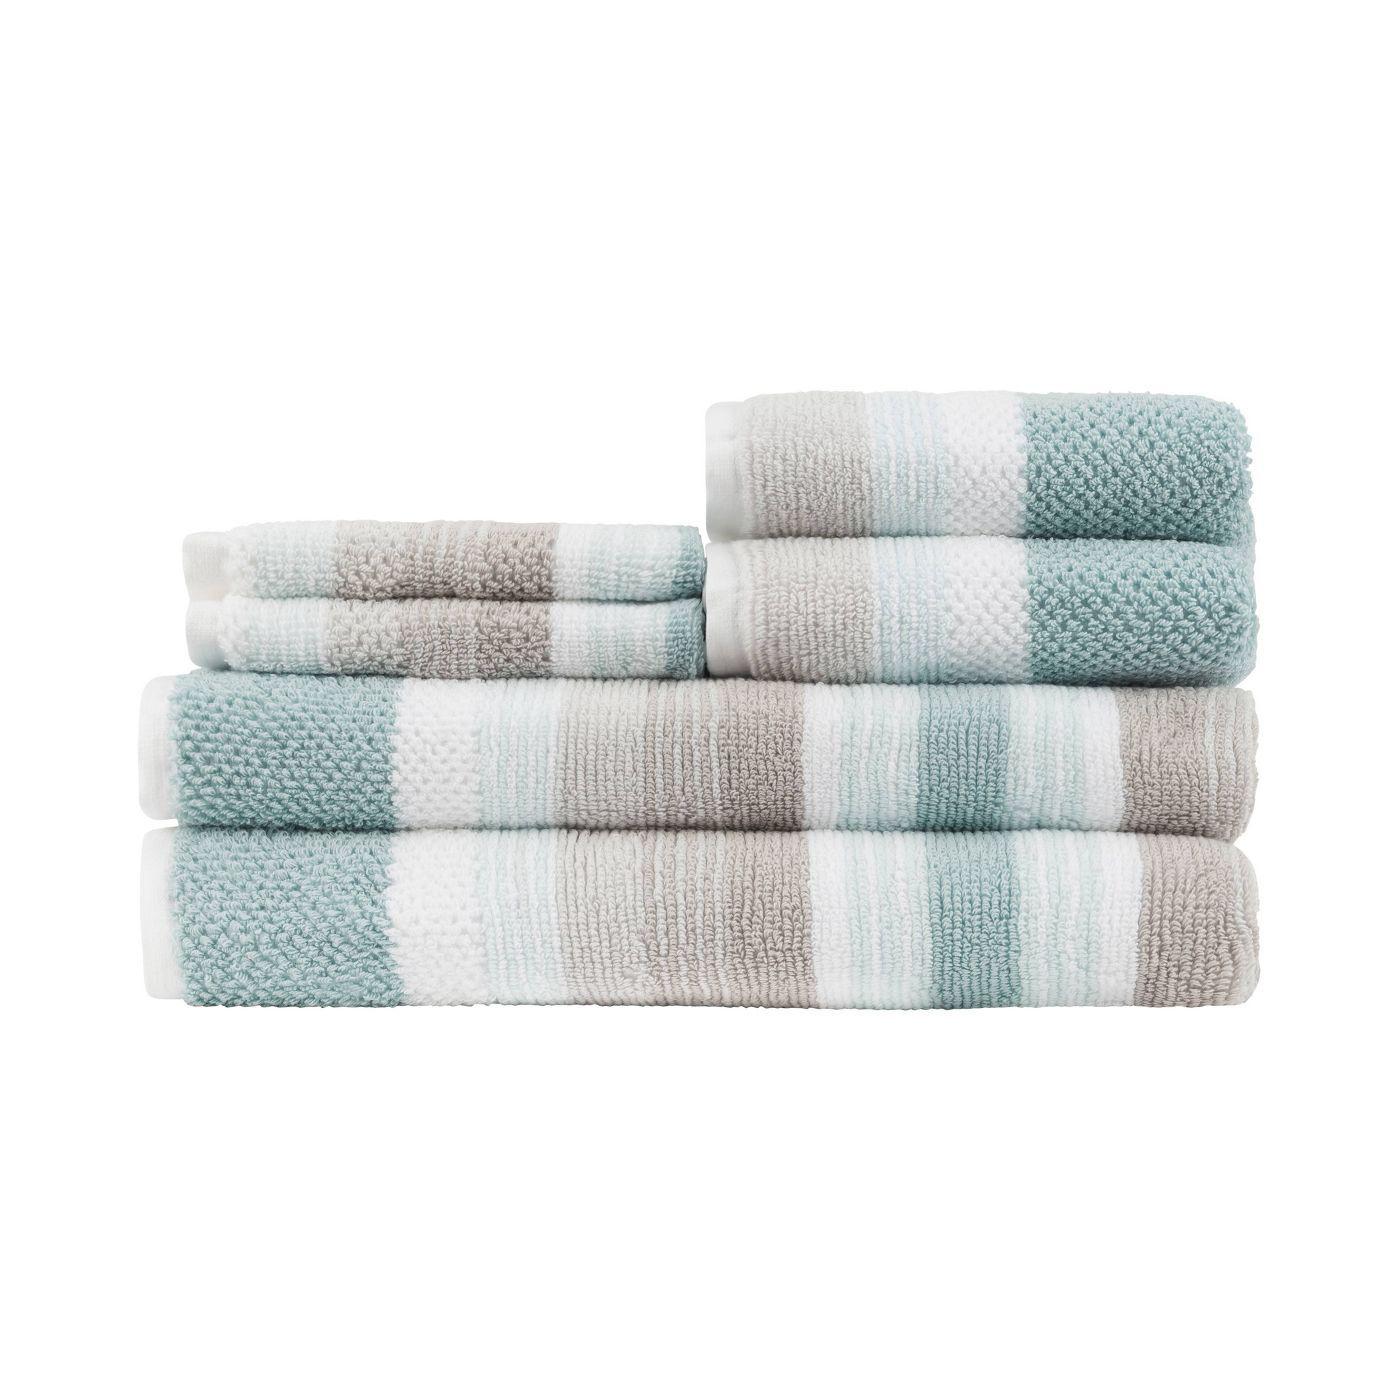 6pc Montauk Bath Towel Set Seaglass Gray Caro Home Towel Set